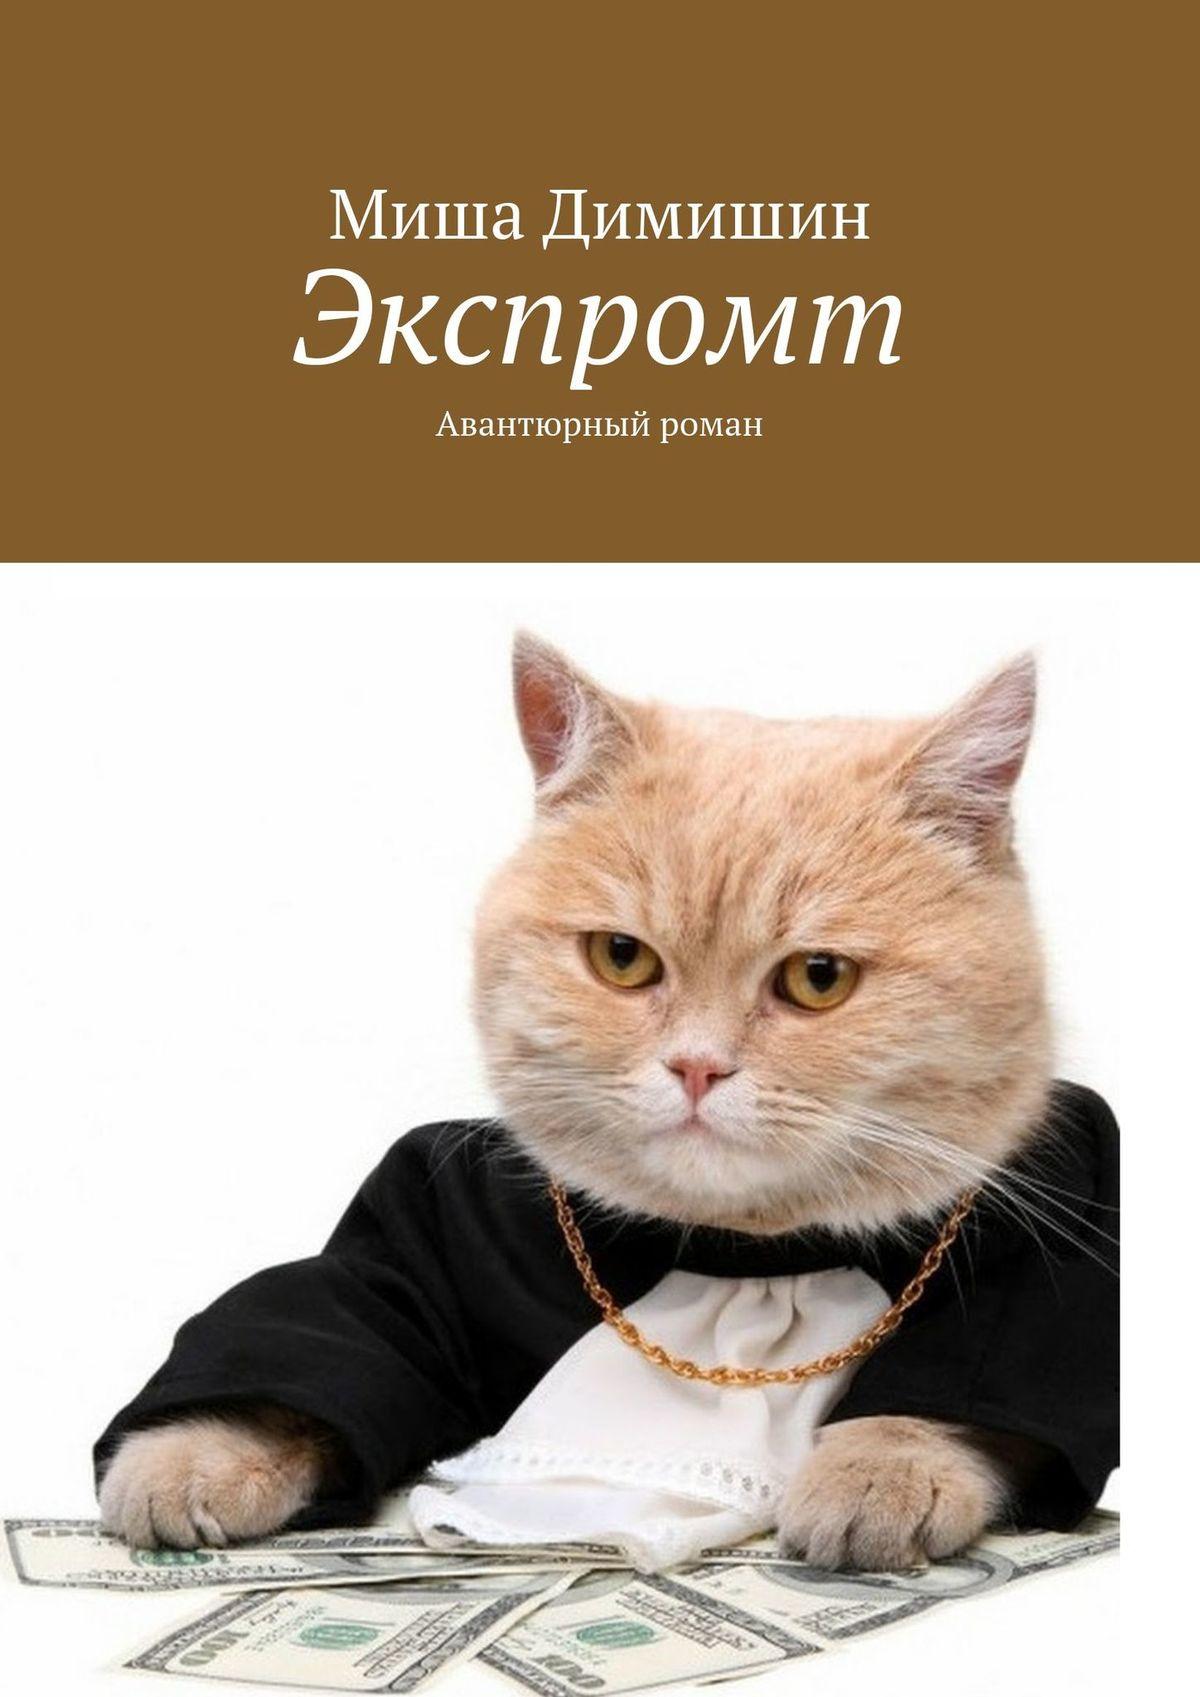 Экспромт. Авантюрный роман